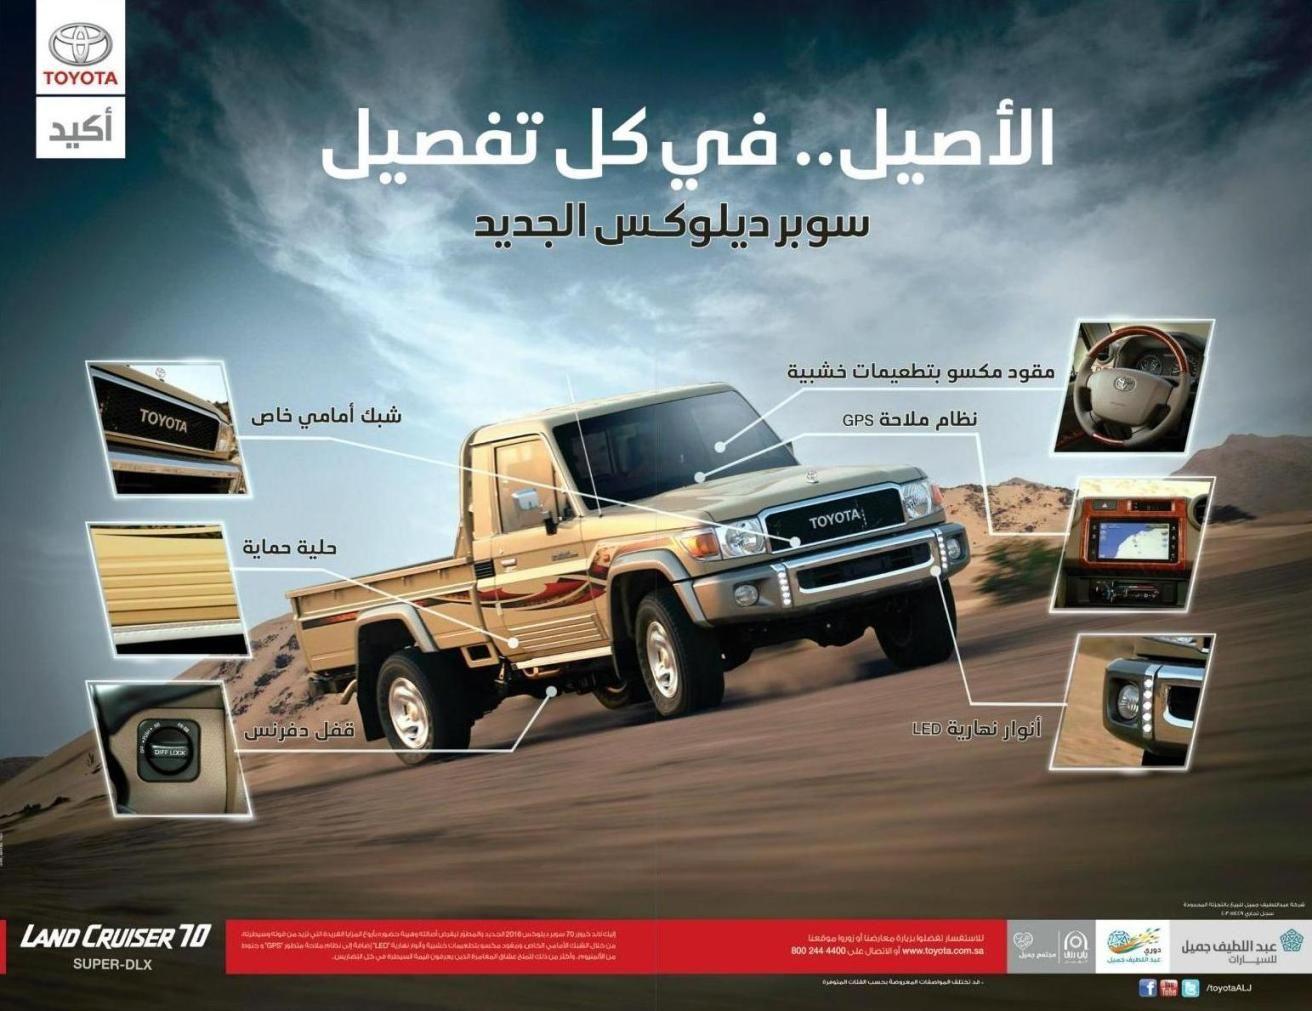 Toyota Land Cruiser 70 Saudi Arabia Land Cruiser Cruisers